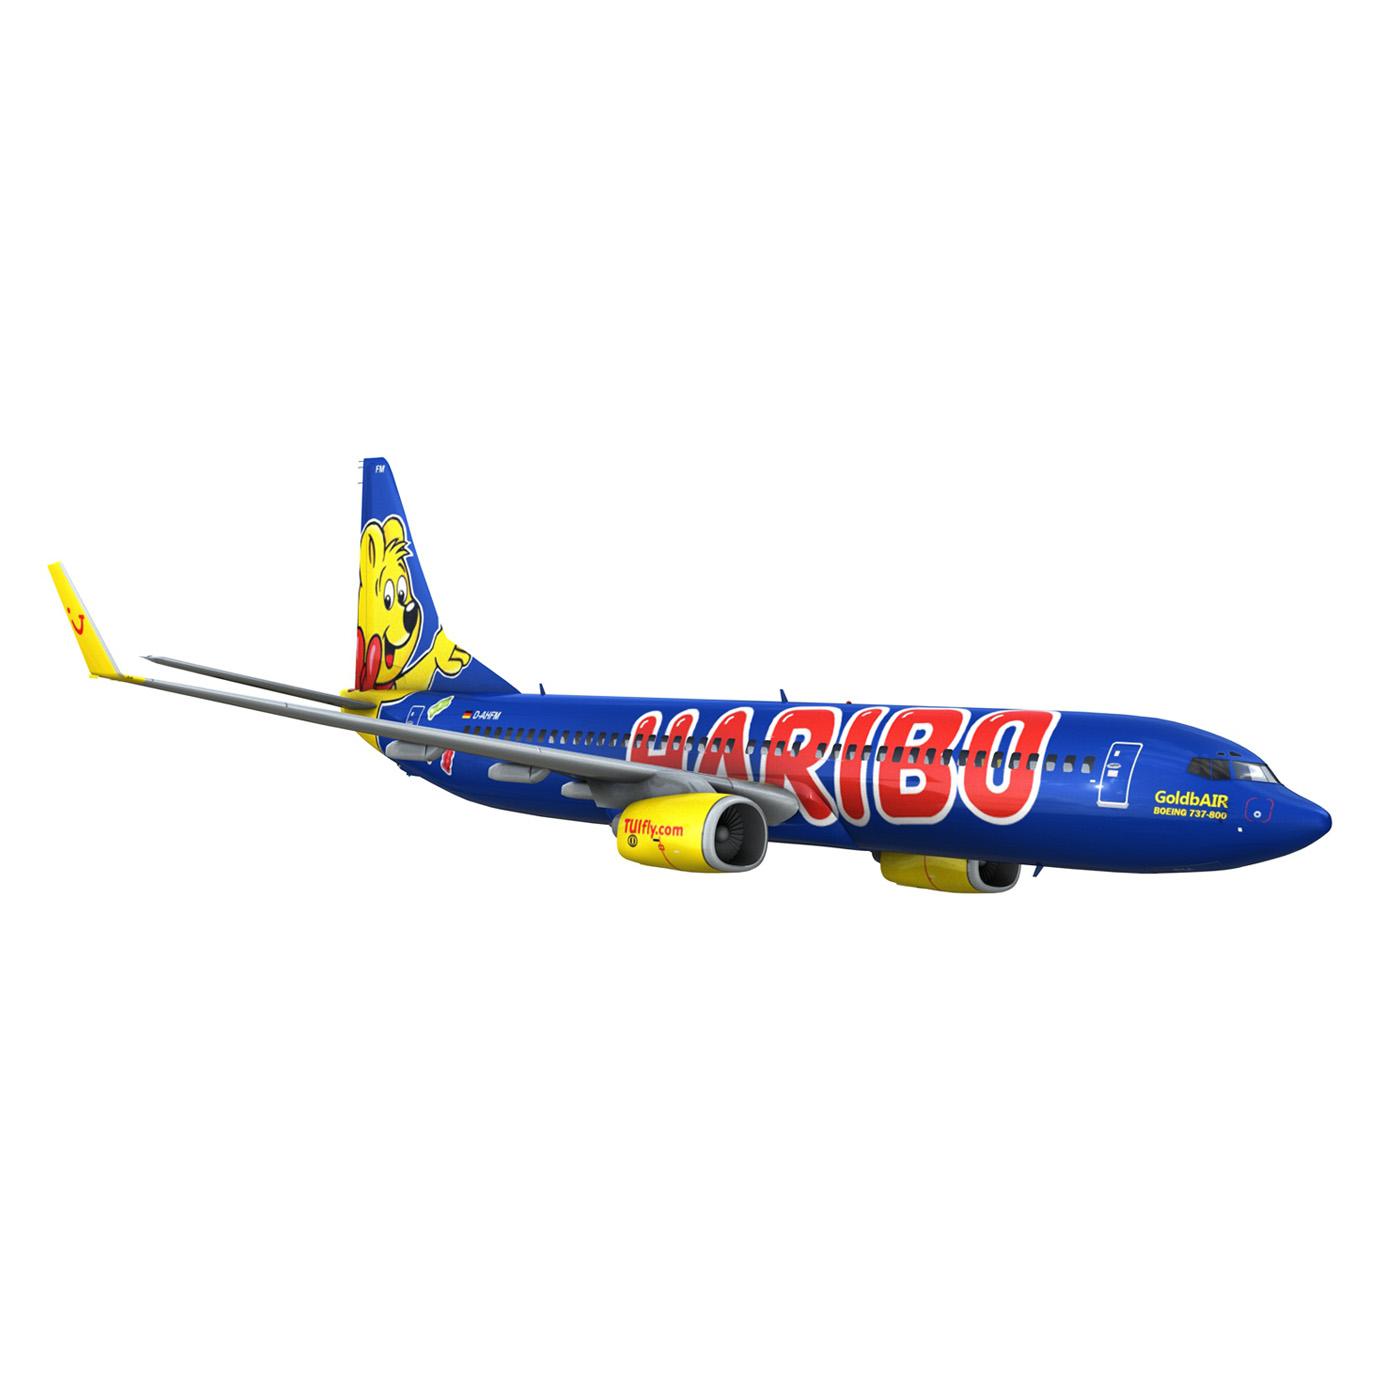 boeing 737-800 goldbair 3d model 3ds fbx c4d lwo obj 293505